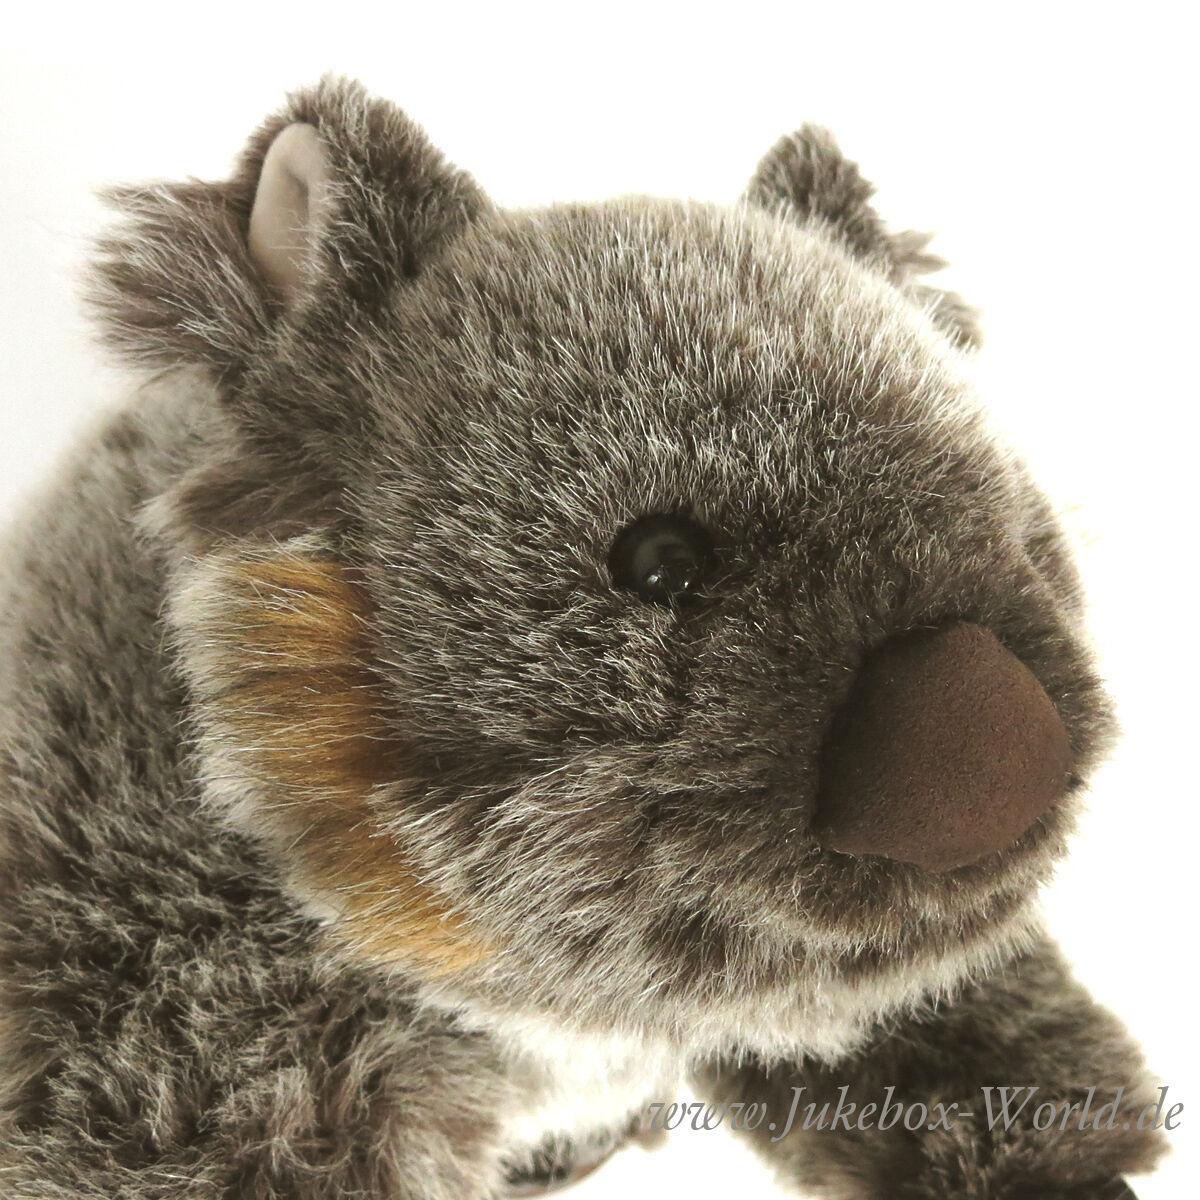 Kösener Kösener Kösener Wombat  damen   6780 -  Plüschtier   Stofftier - besonders kuschelig 6d450e